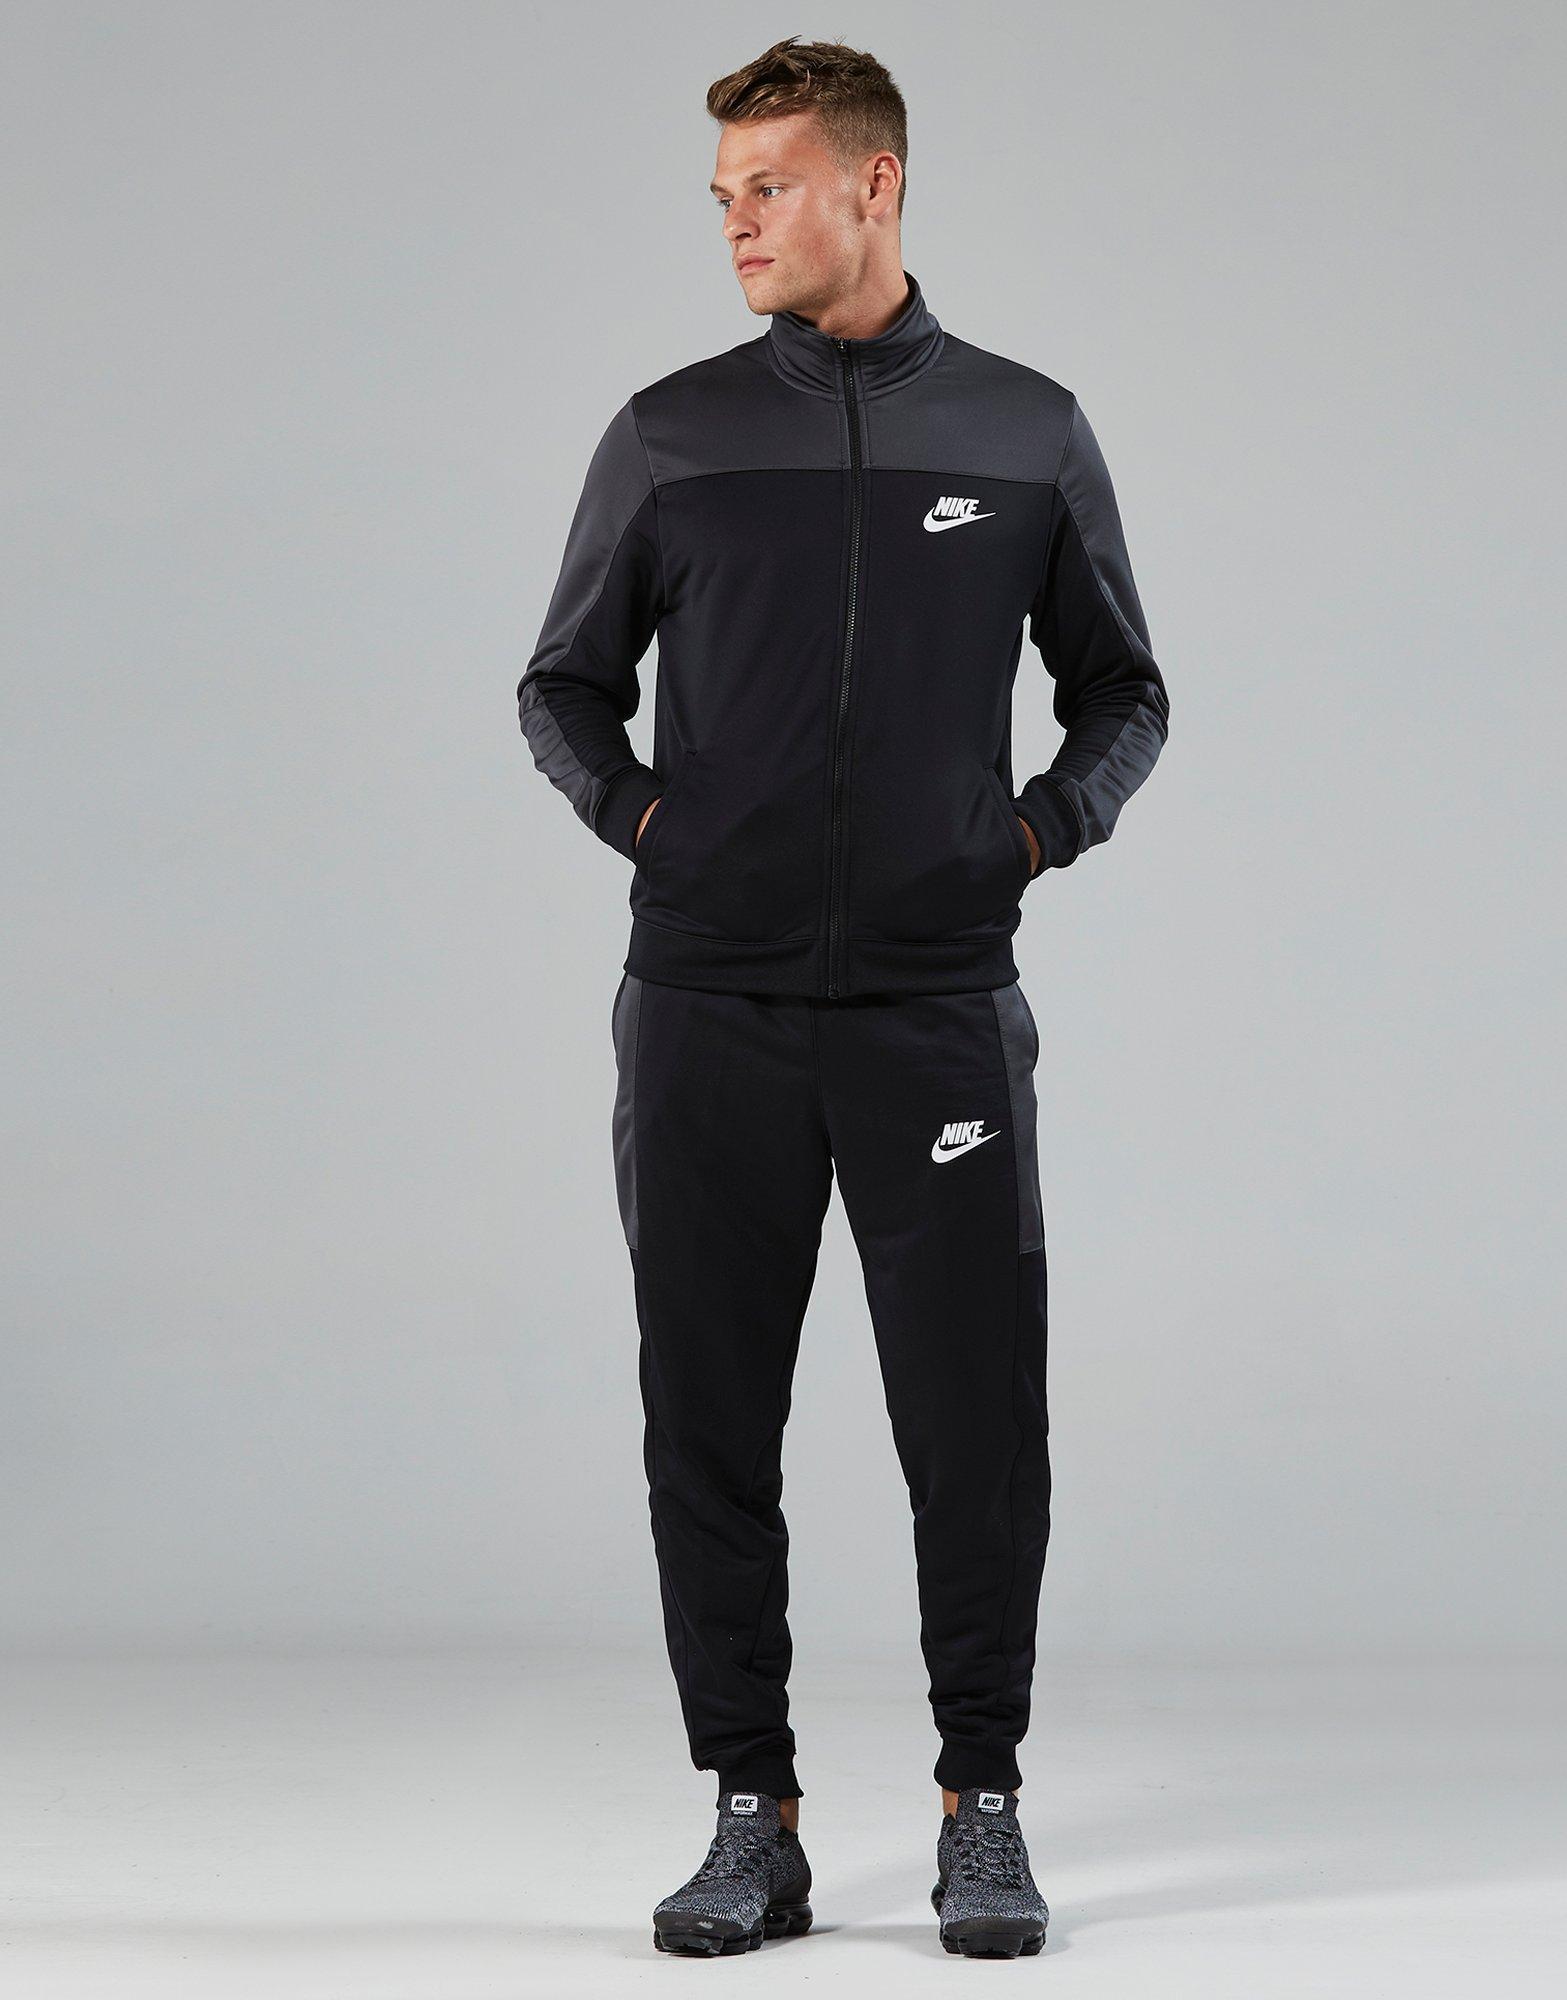 7dc047ac45 View  sale retailer 4a925 383f8 Lyst - Nike Season Colourblock Tracksuit in  Black for Men ...